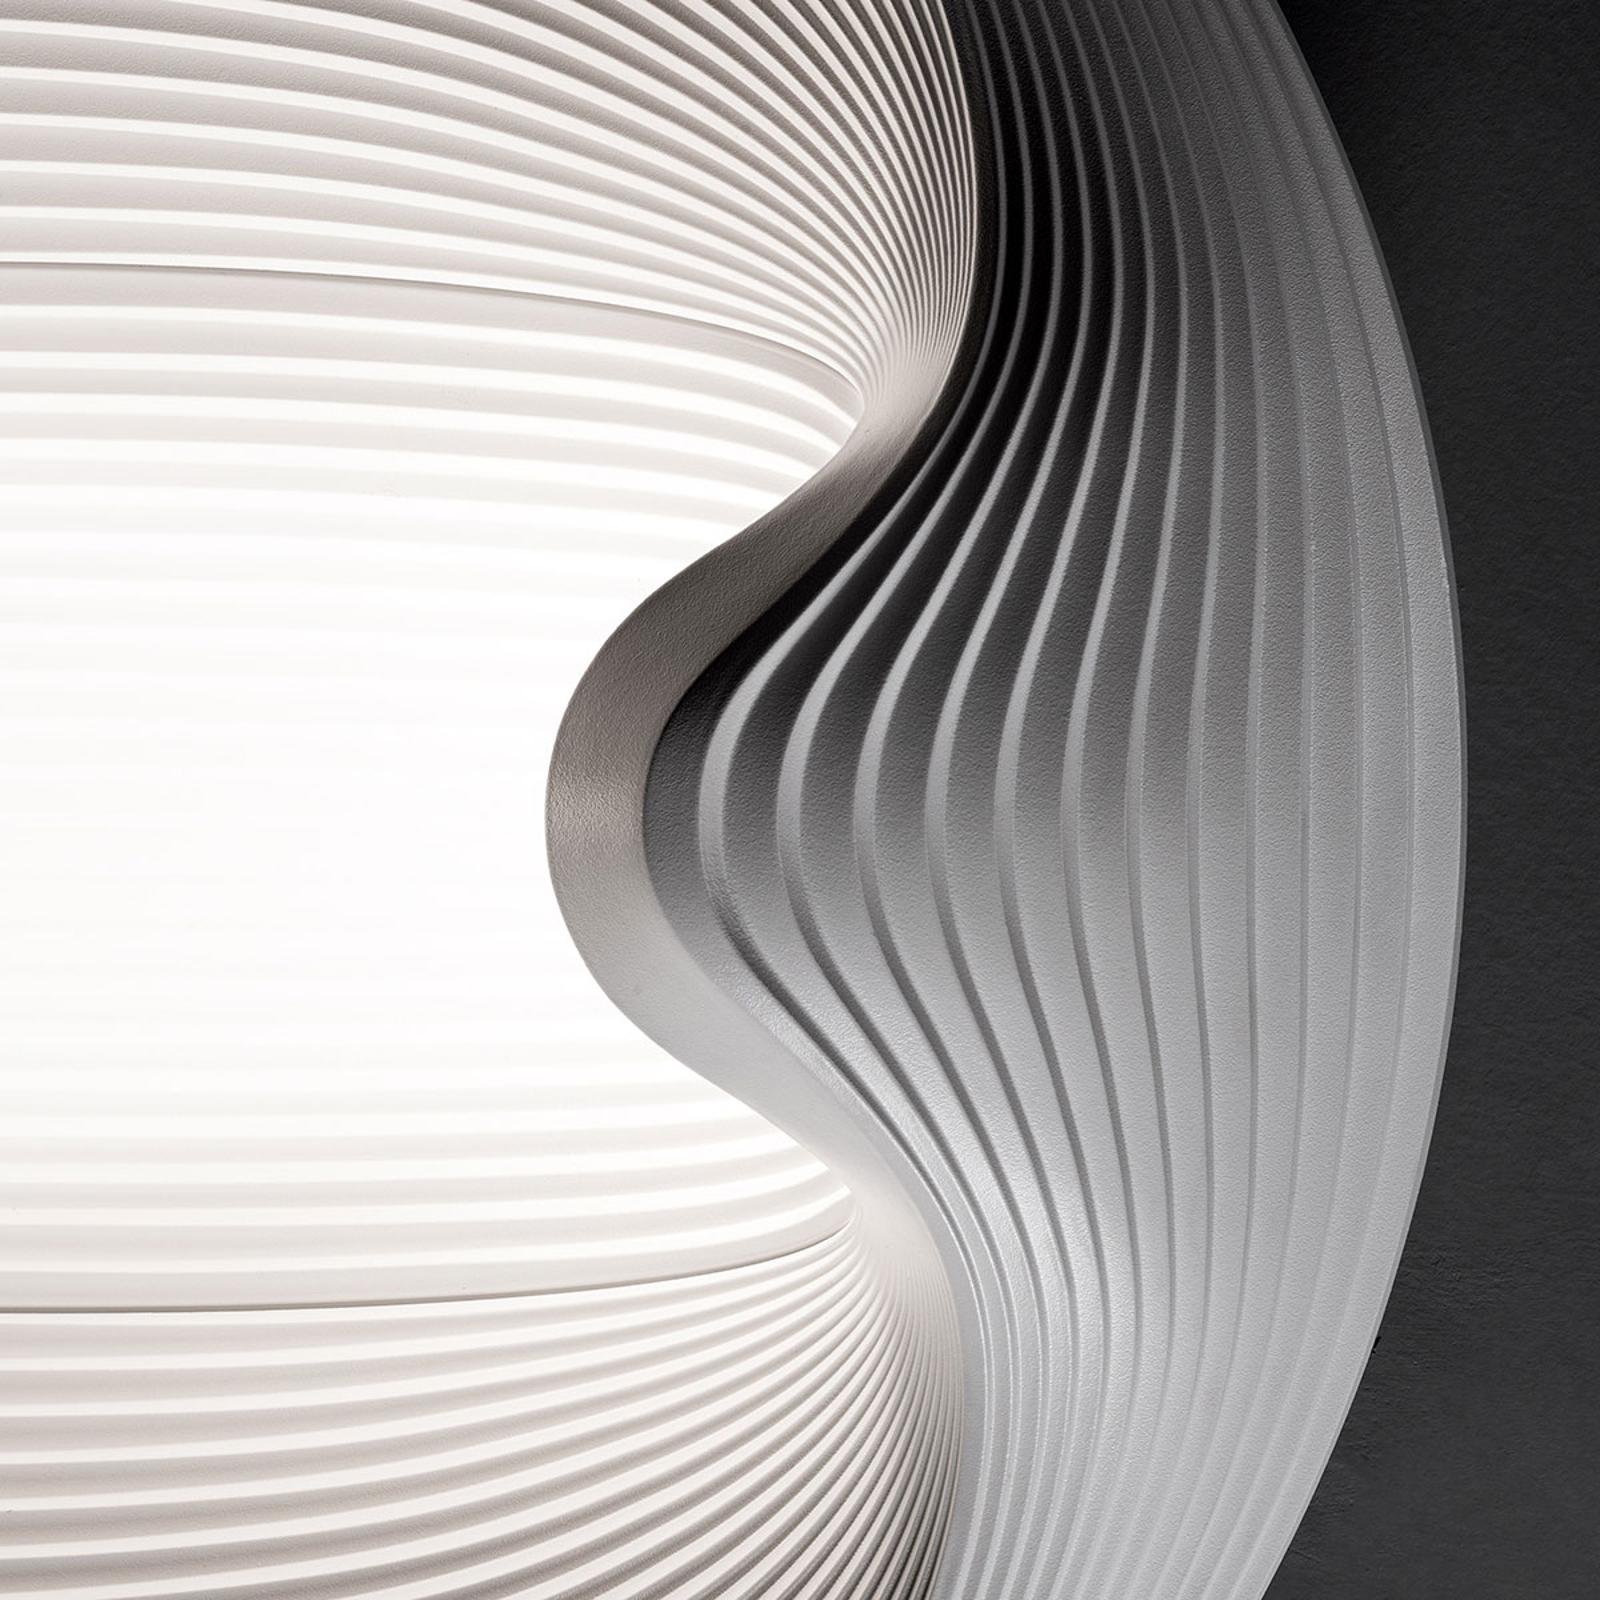 Cini&Nils Sestessa plafonnier LED Casambi